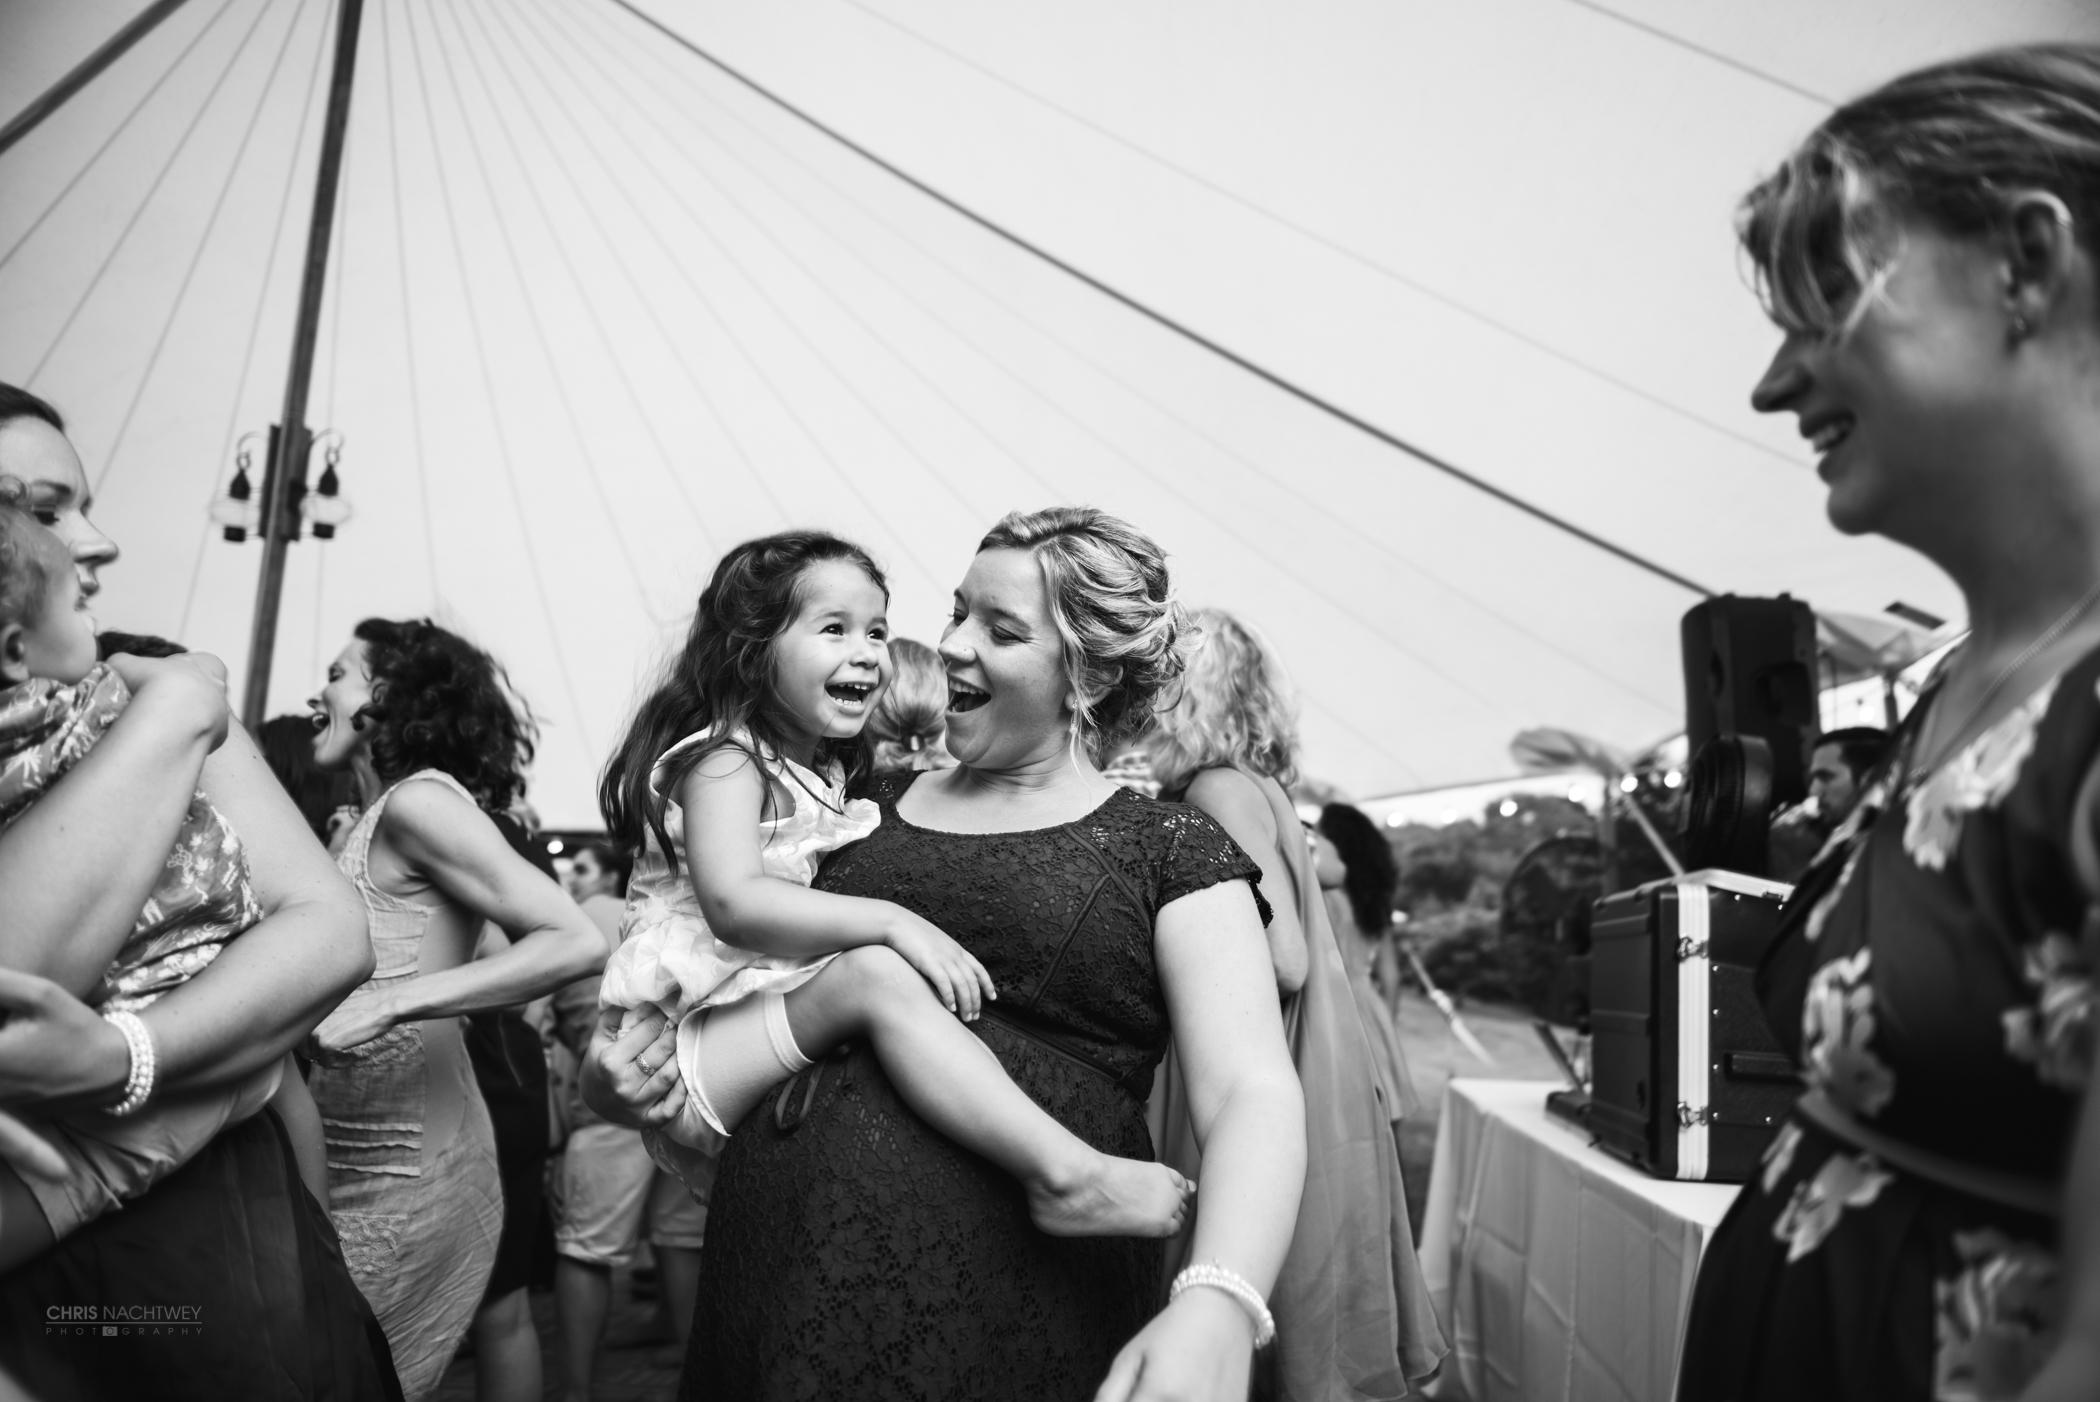 connecticut-mystic-wedding-photographer-chris-nachtwey.jpg